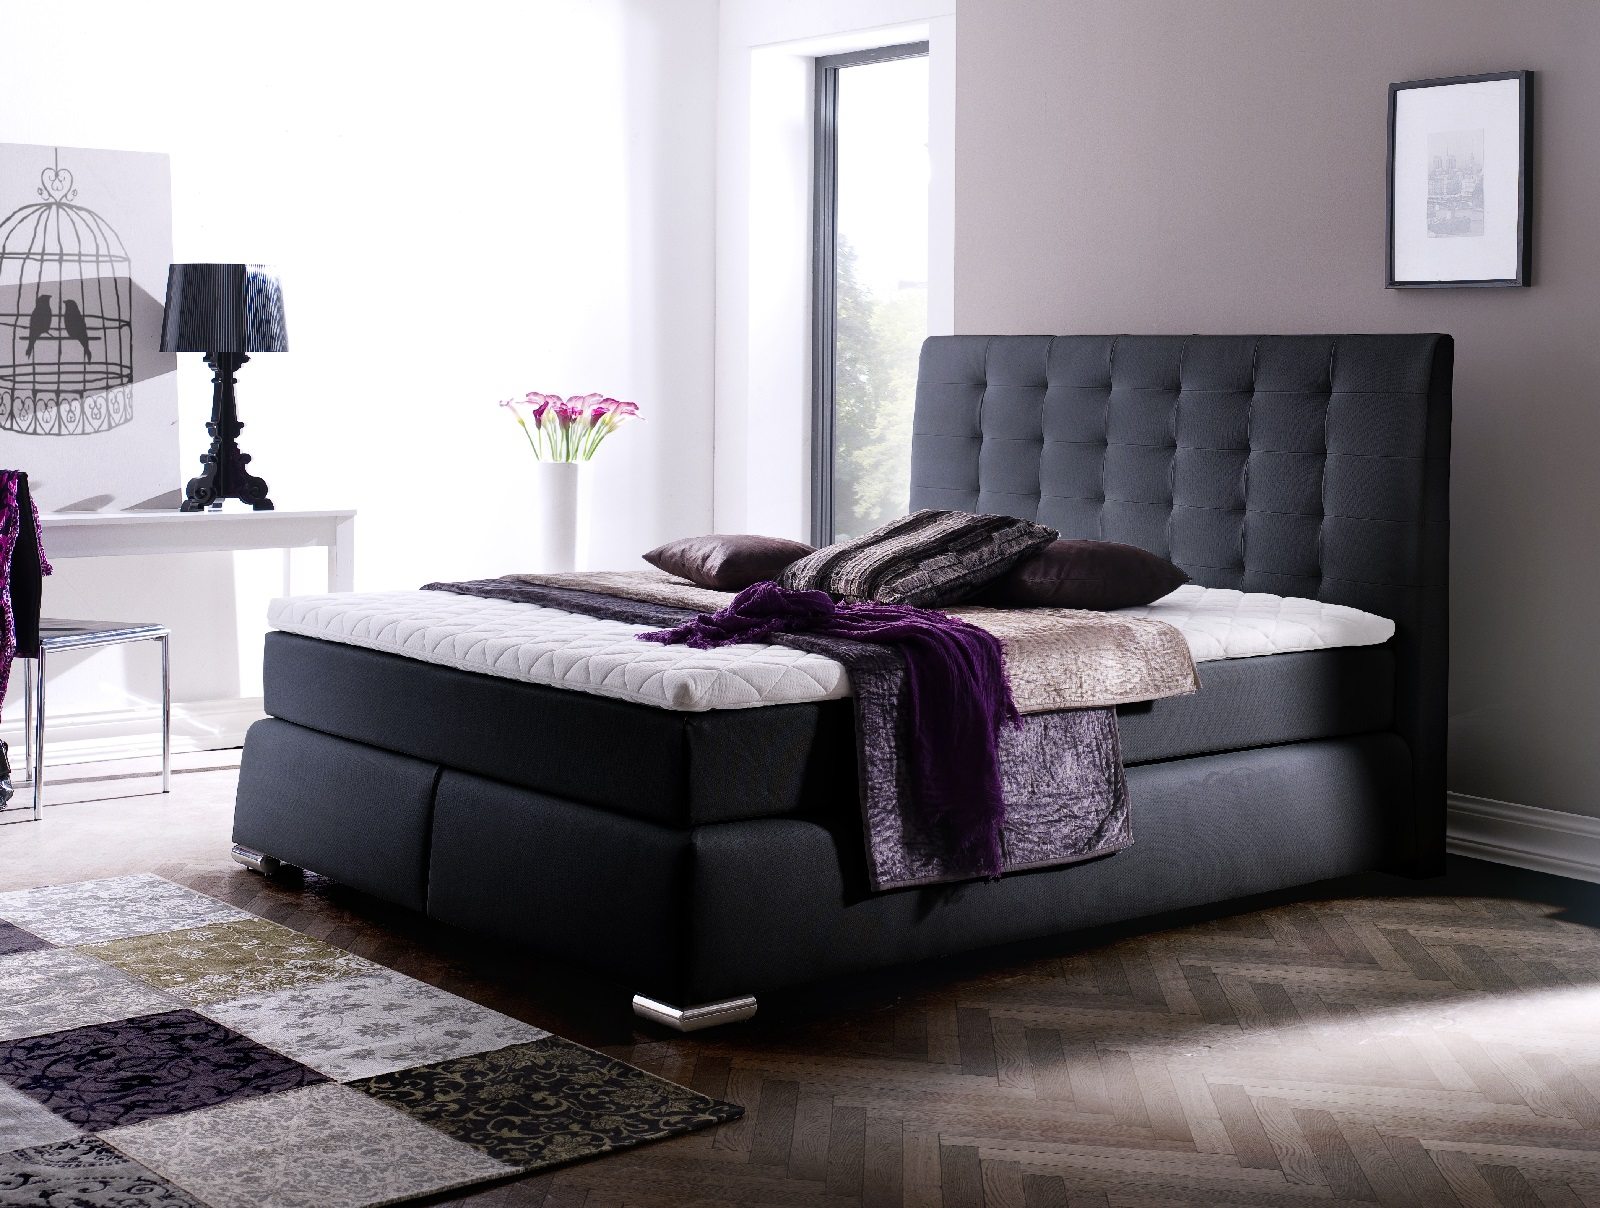 boxspringbett claudine schwarz 160cm x 200cm. Black Bedroom Furniture Sets. Home Design Ideas